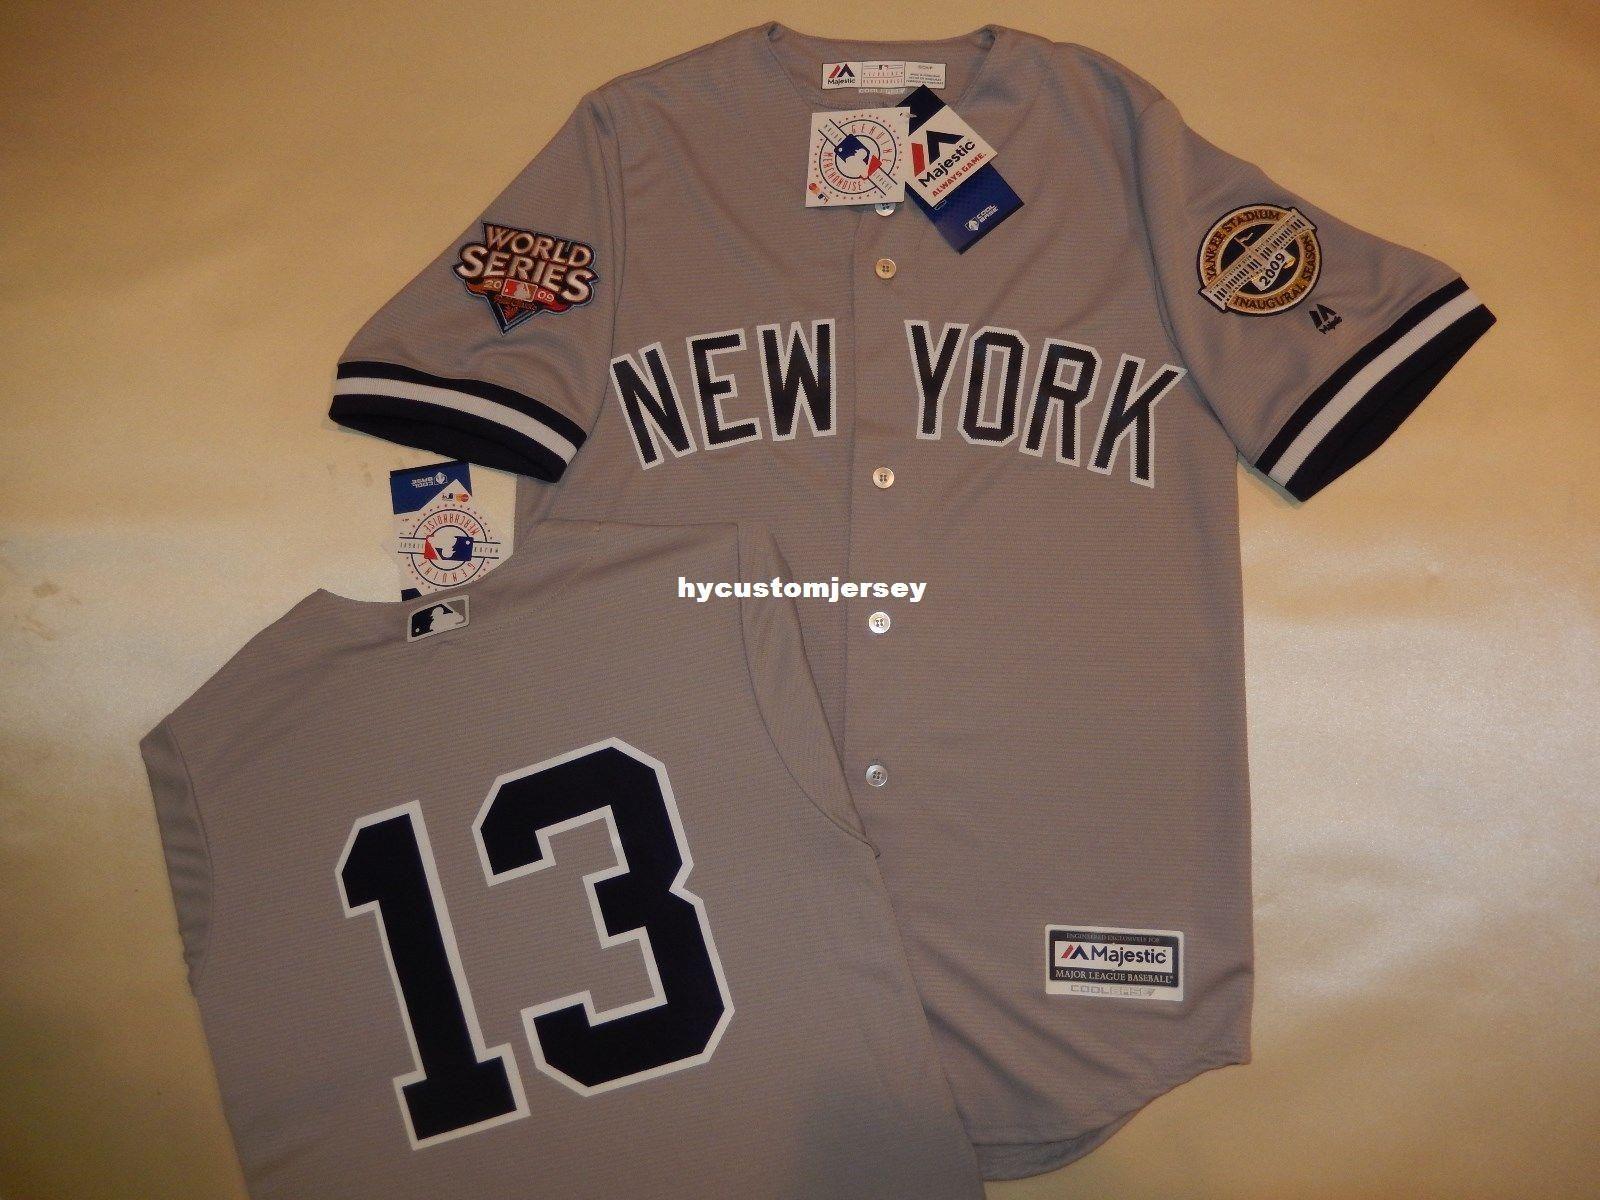 newest 821c8 aca45 Cheap custom New York 13# ALEX RODRIGUEZ 2009 WORLD SERIES Baseball Jersey  GRAY New Mens stitched jerseys Big And Tall SIZE XS-6XL For sale